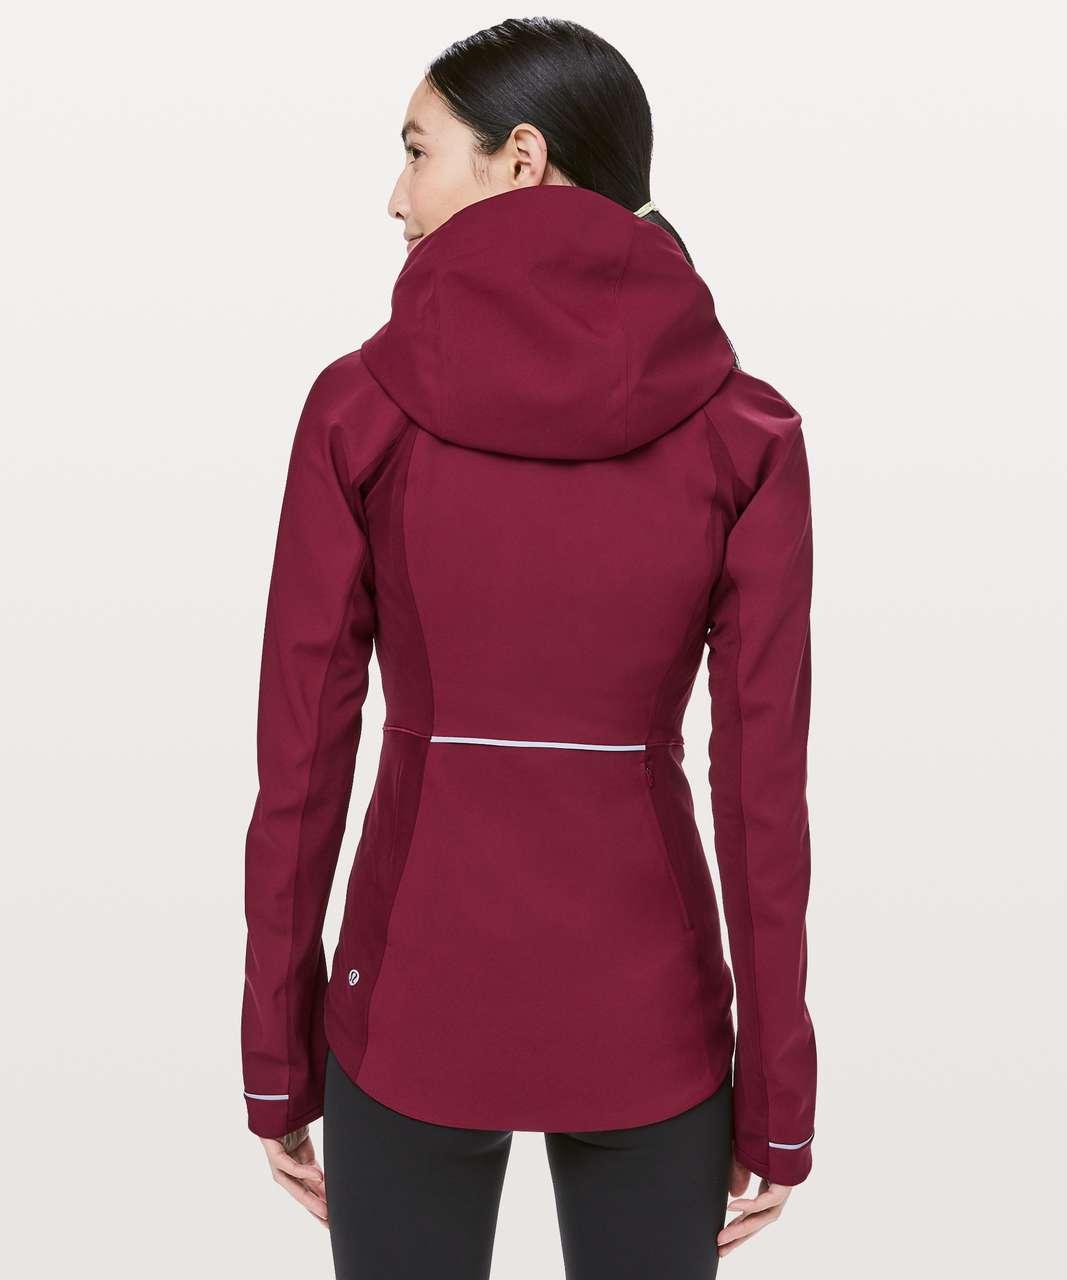 Lululemon Cross Chill Jacket - Deep Ruby